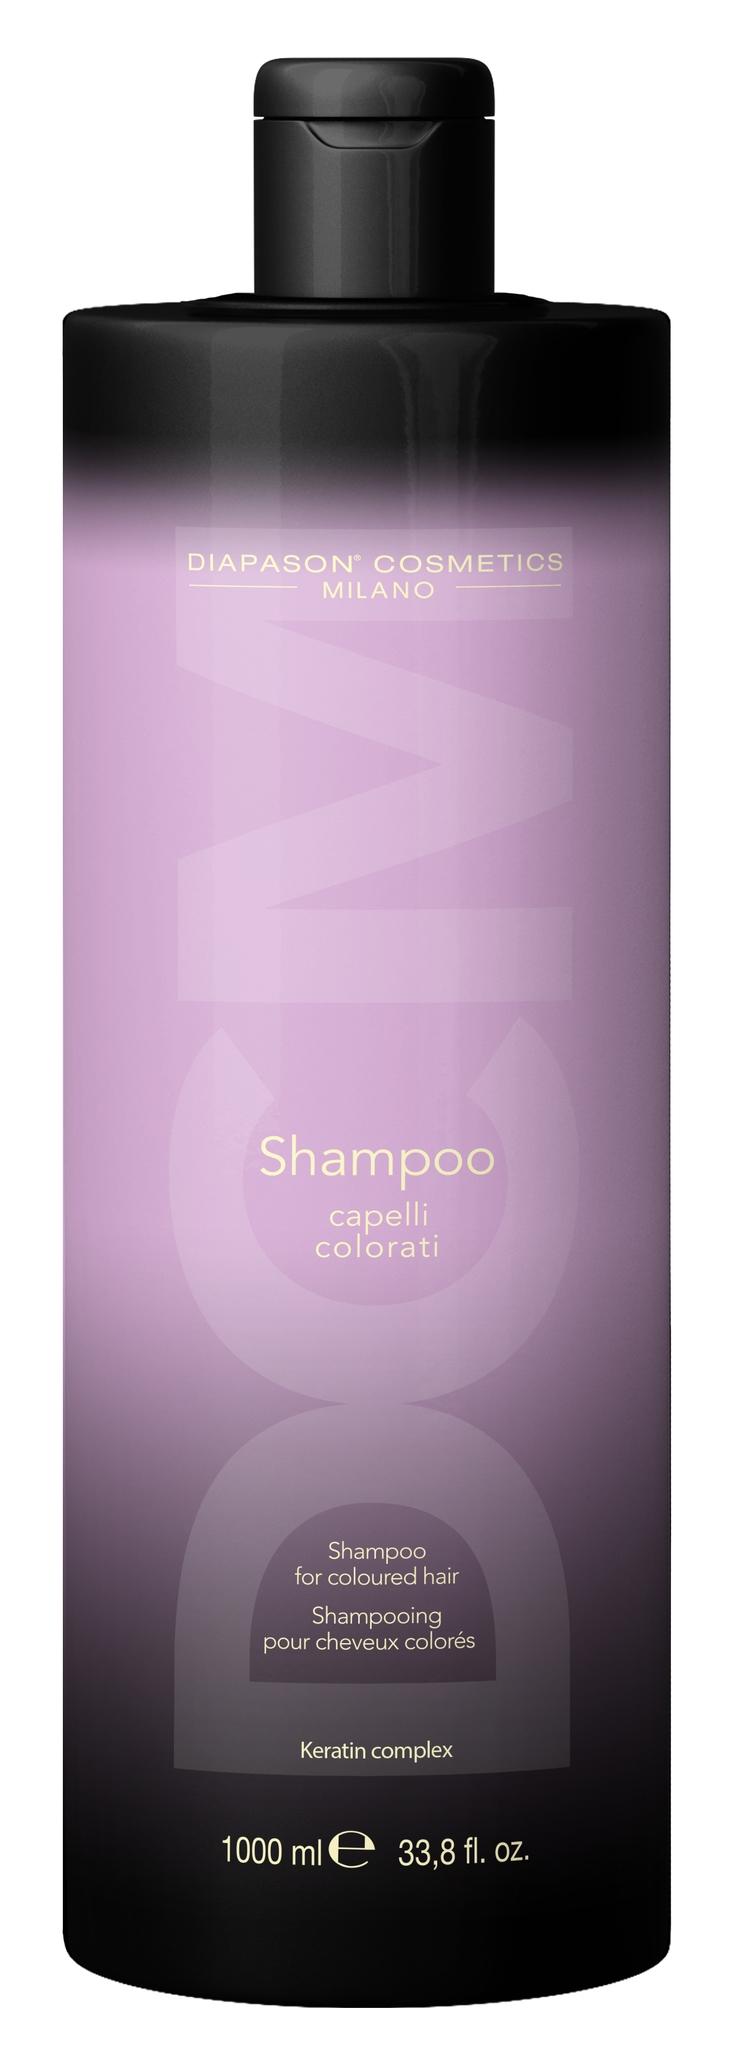 "Lisap Шампунь для Защиты Цвета Окрашенных Волос с Keratin Complex - ""DCM Shampoo for Coloured Hair"", 1000 мл"